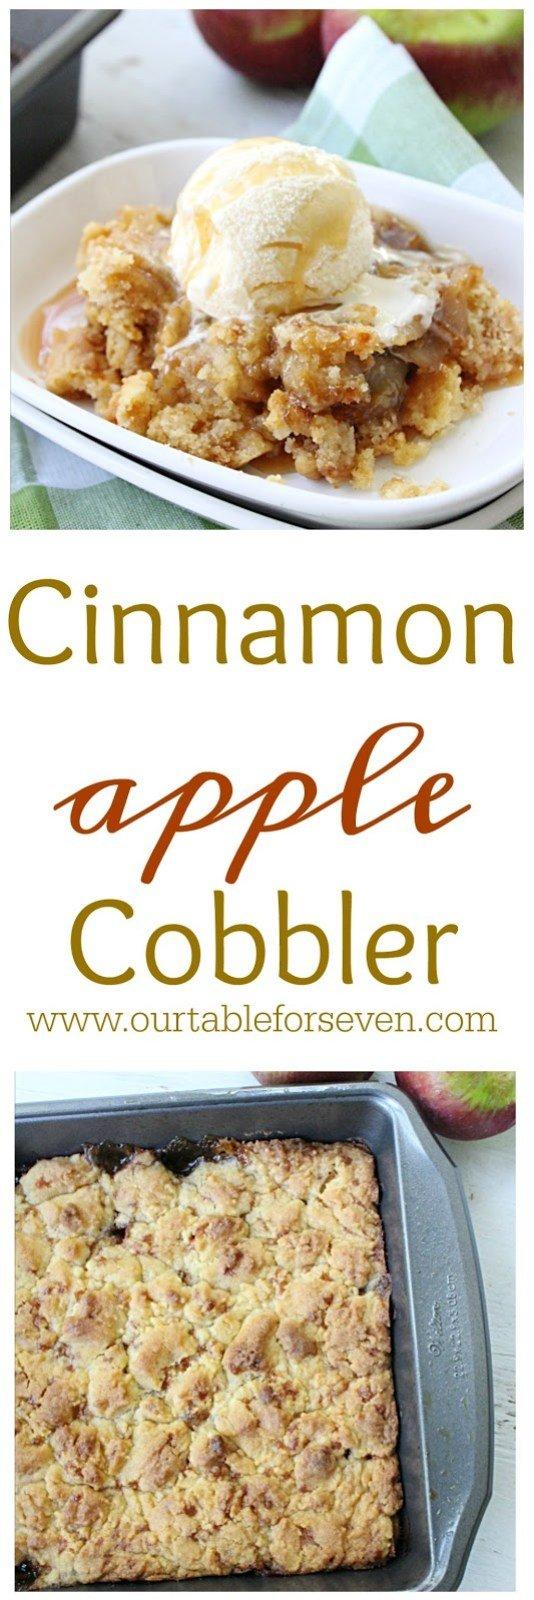 Cinnamon Apple Cobbler from Table for Seven